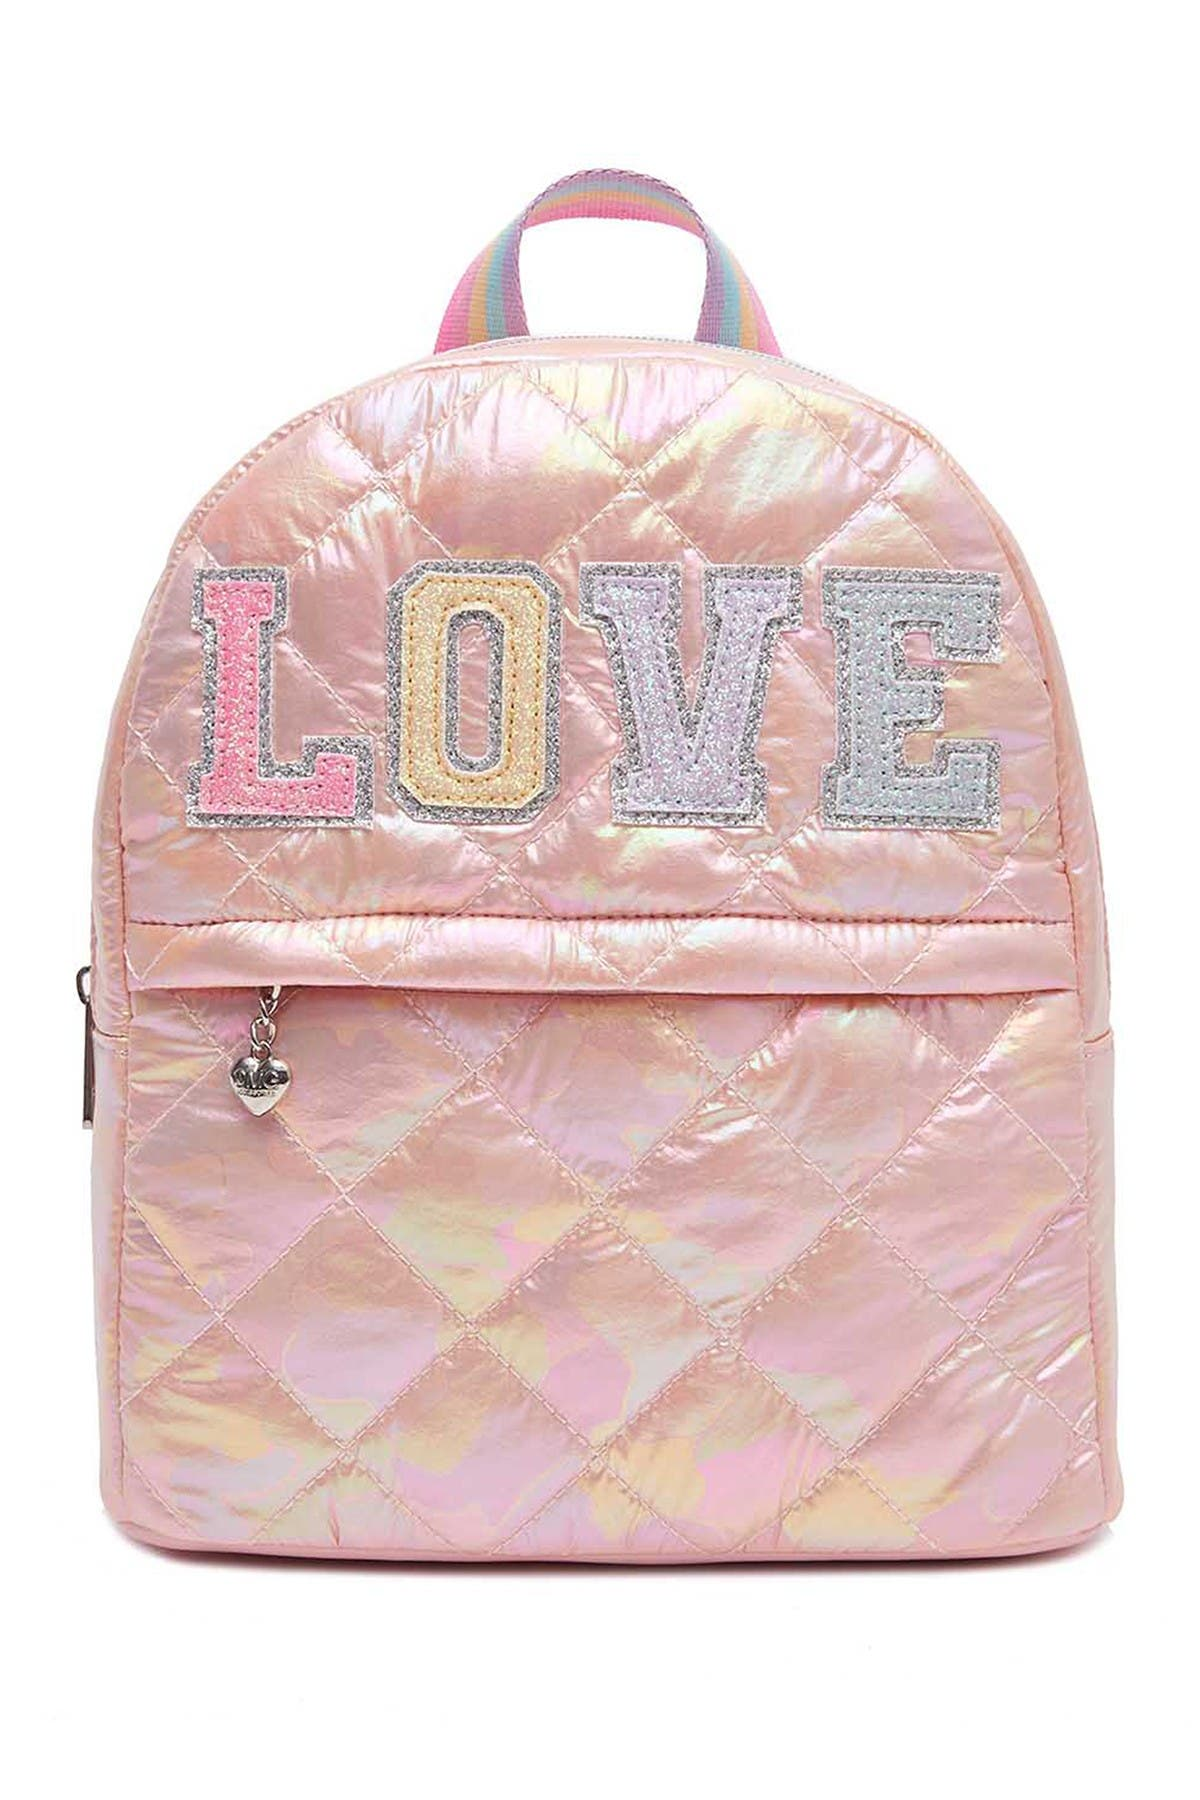 Image of OMG! Accessories Love Puffer Mini Backpack